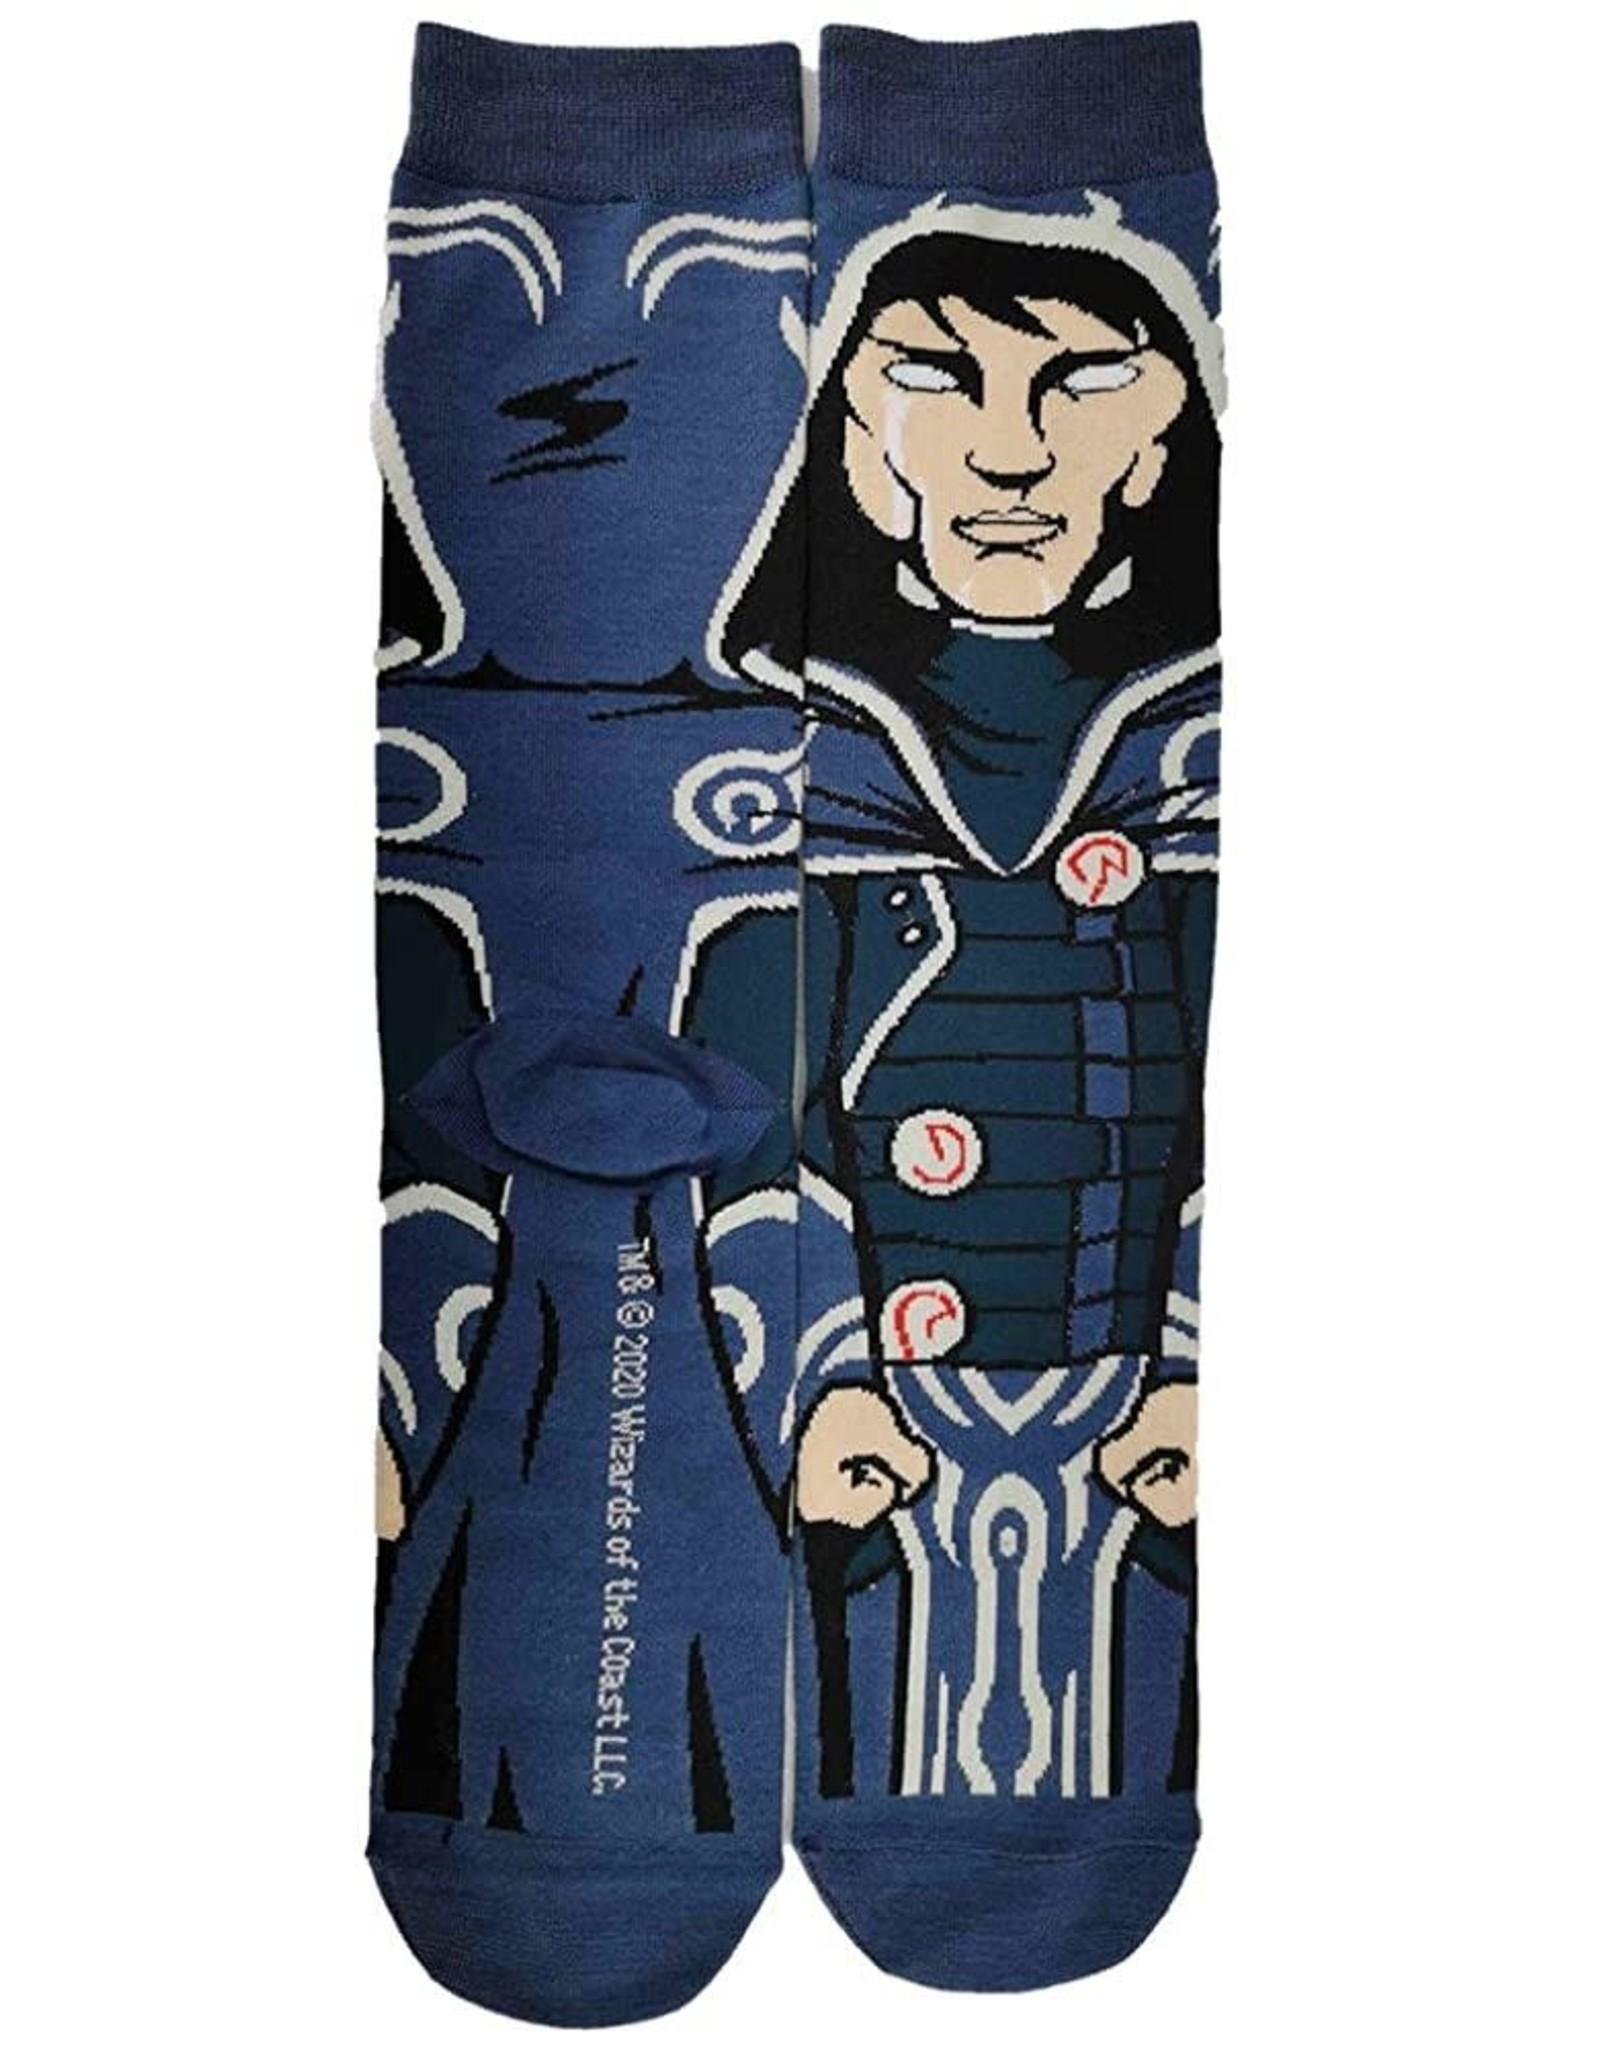 Bioworld Magic The Gathering - Jace Crew Socks